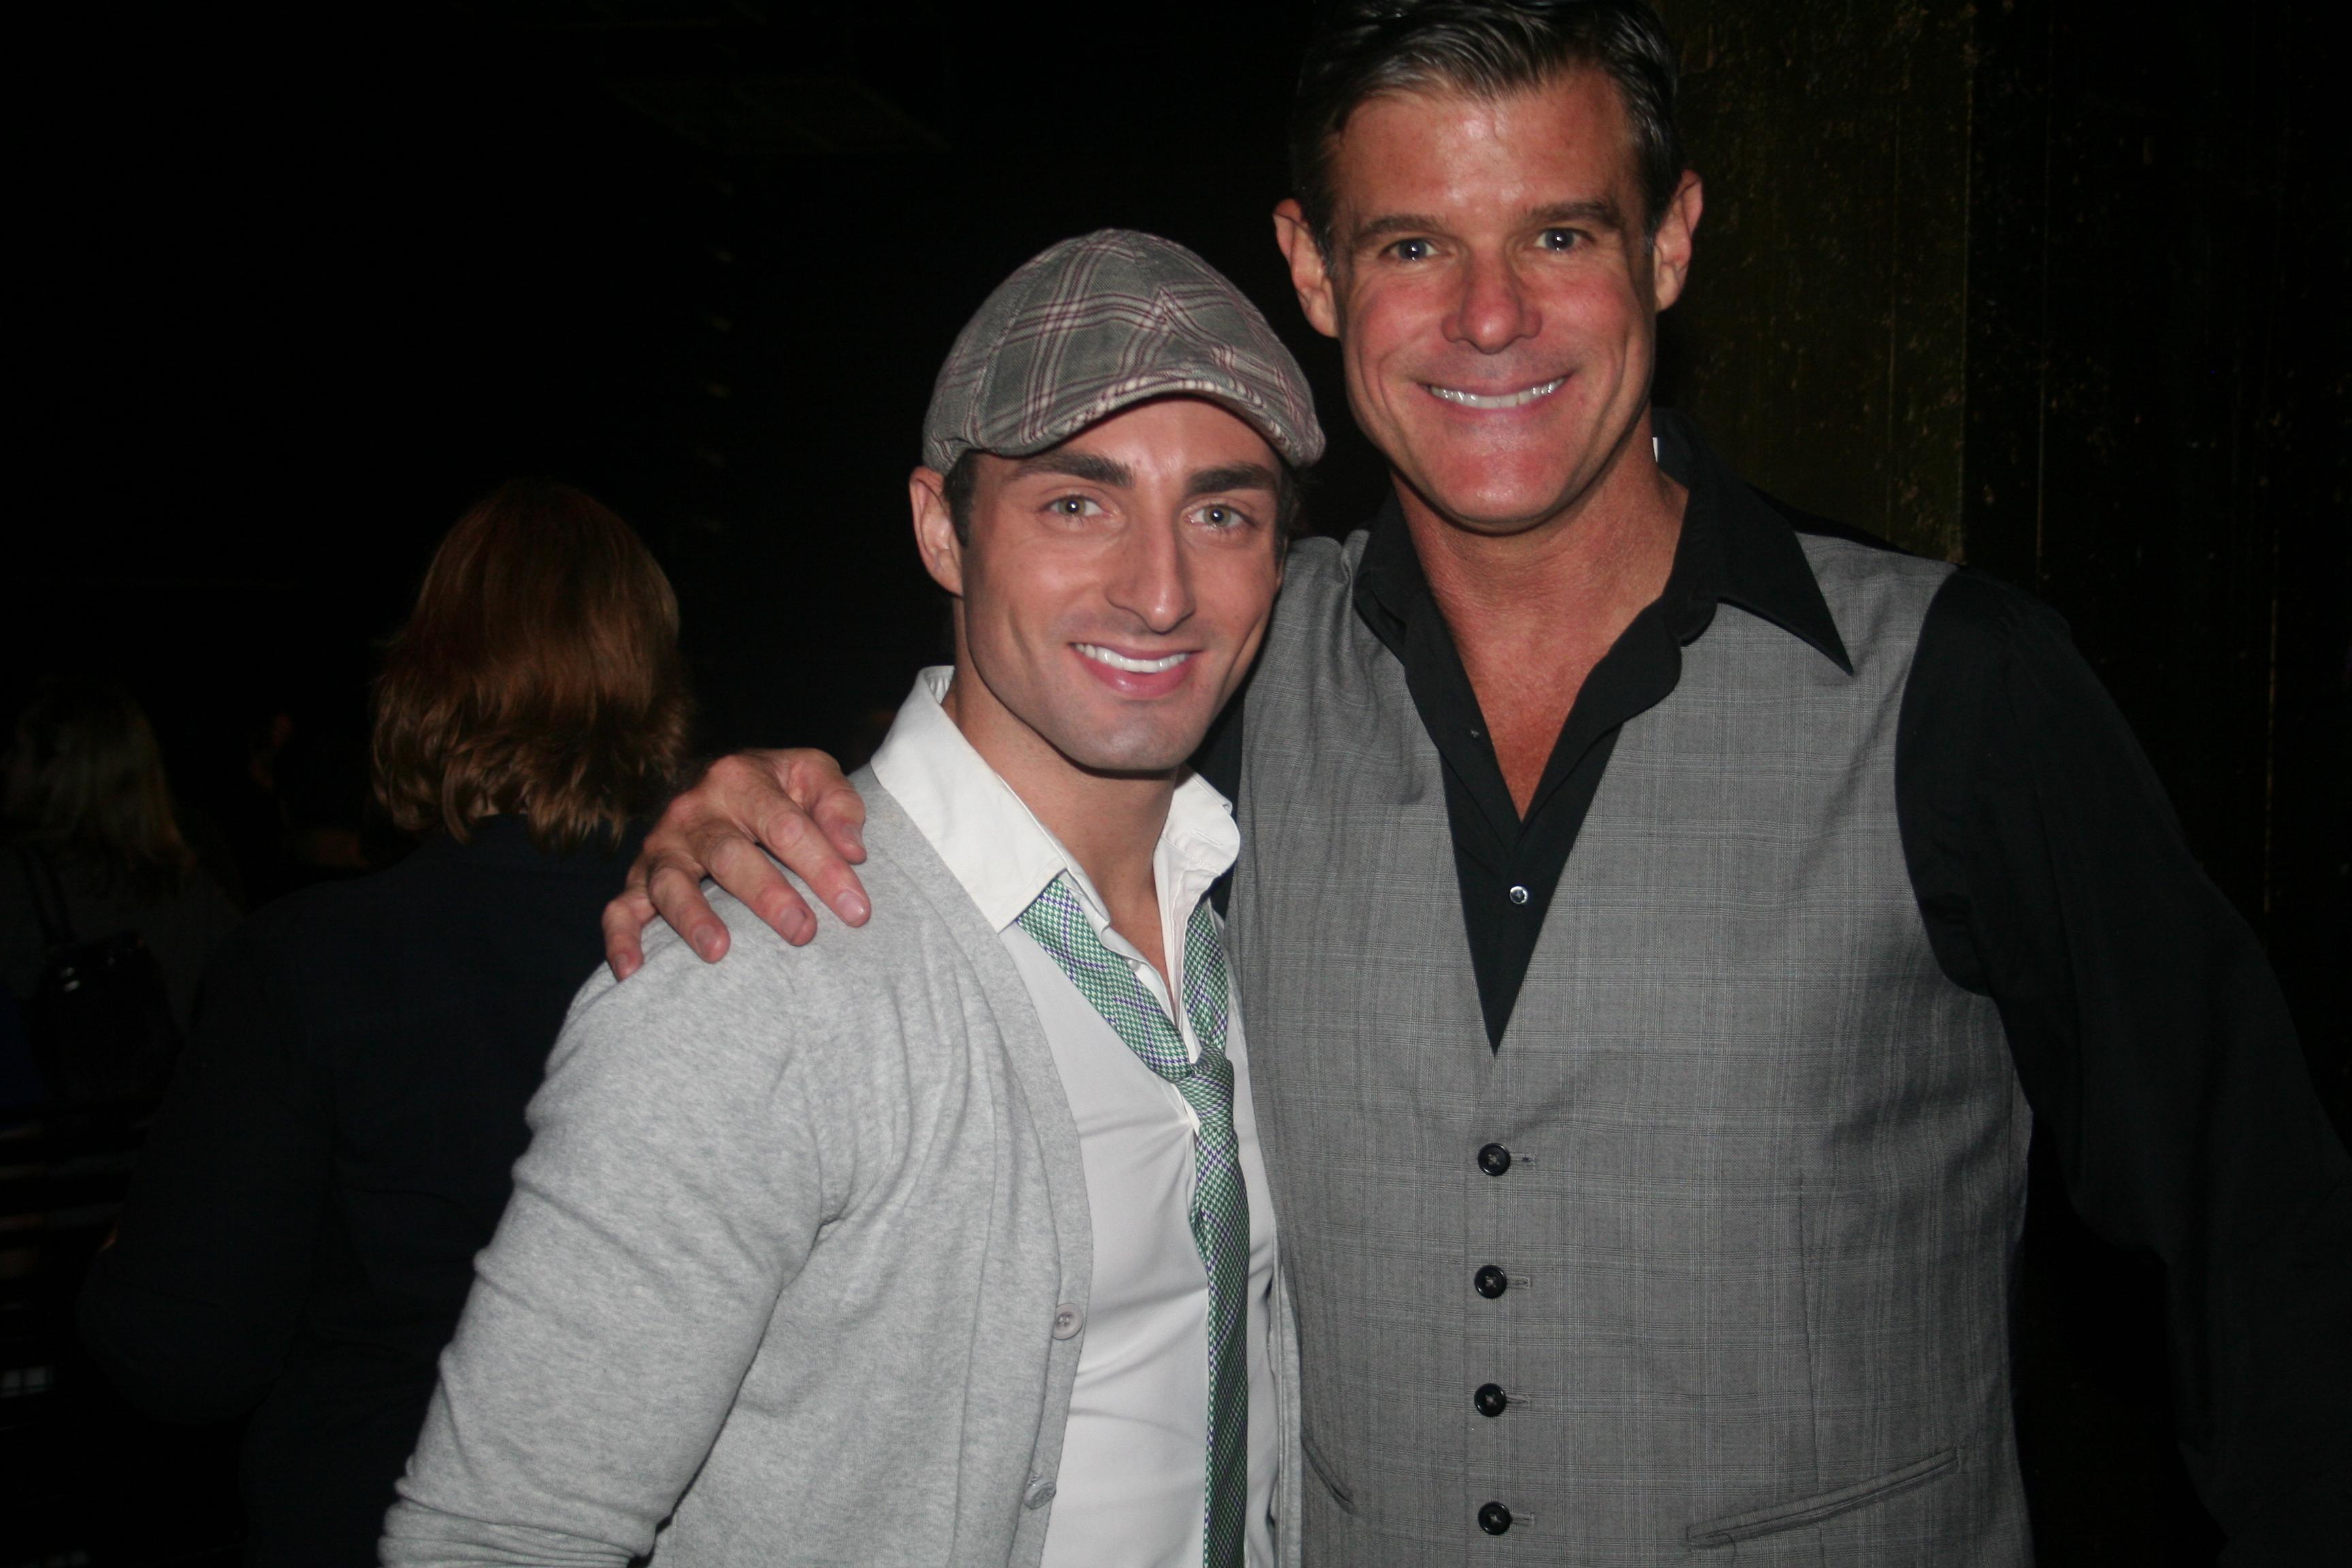 Celebrity Table Co Hosts; Scott Nevins And Michael Lee Scott